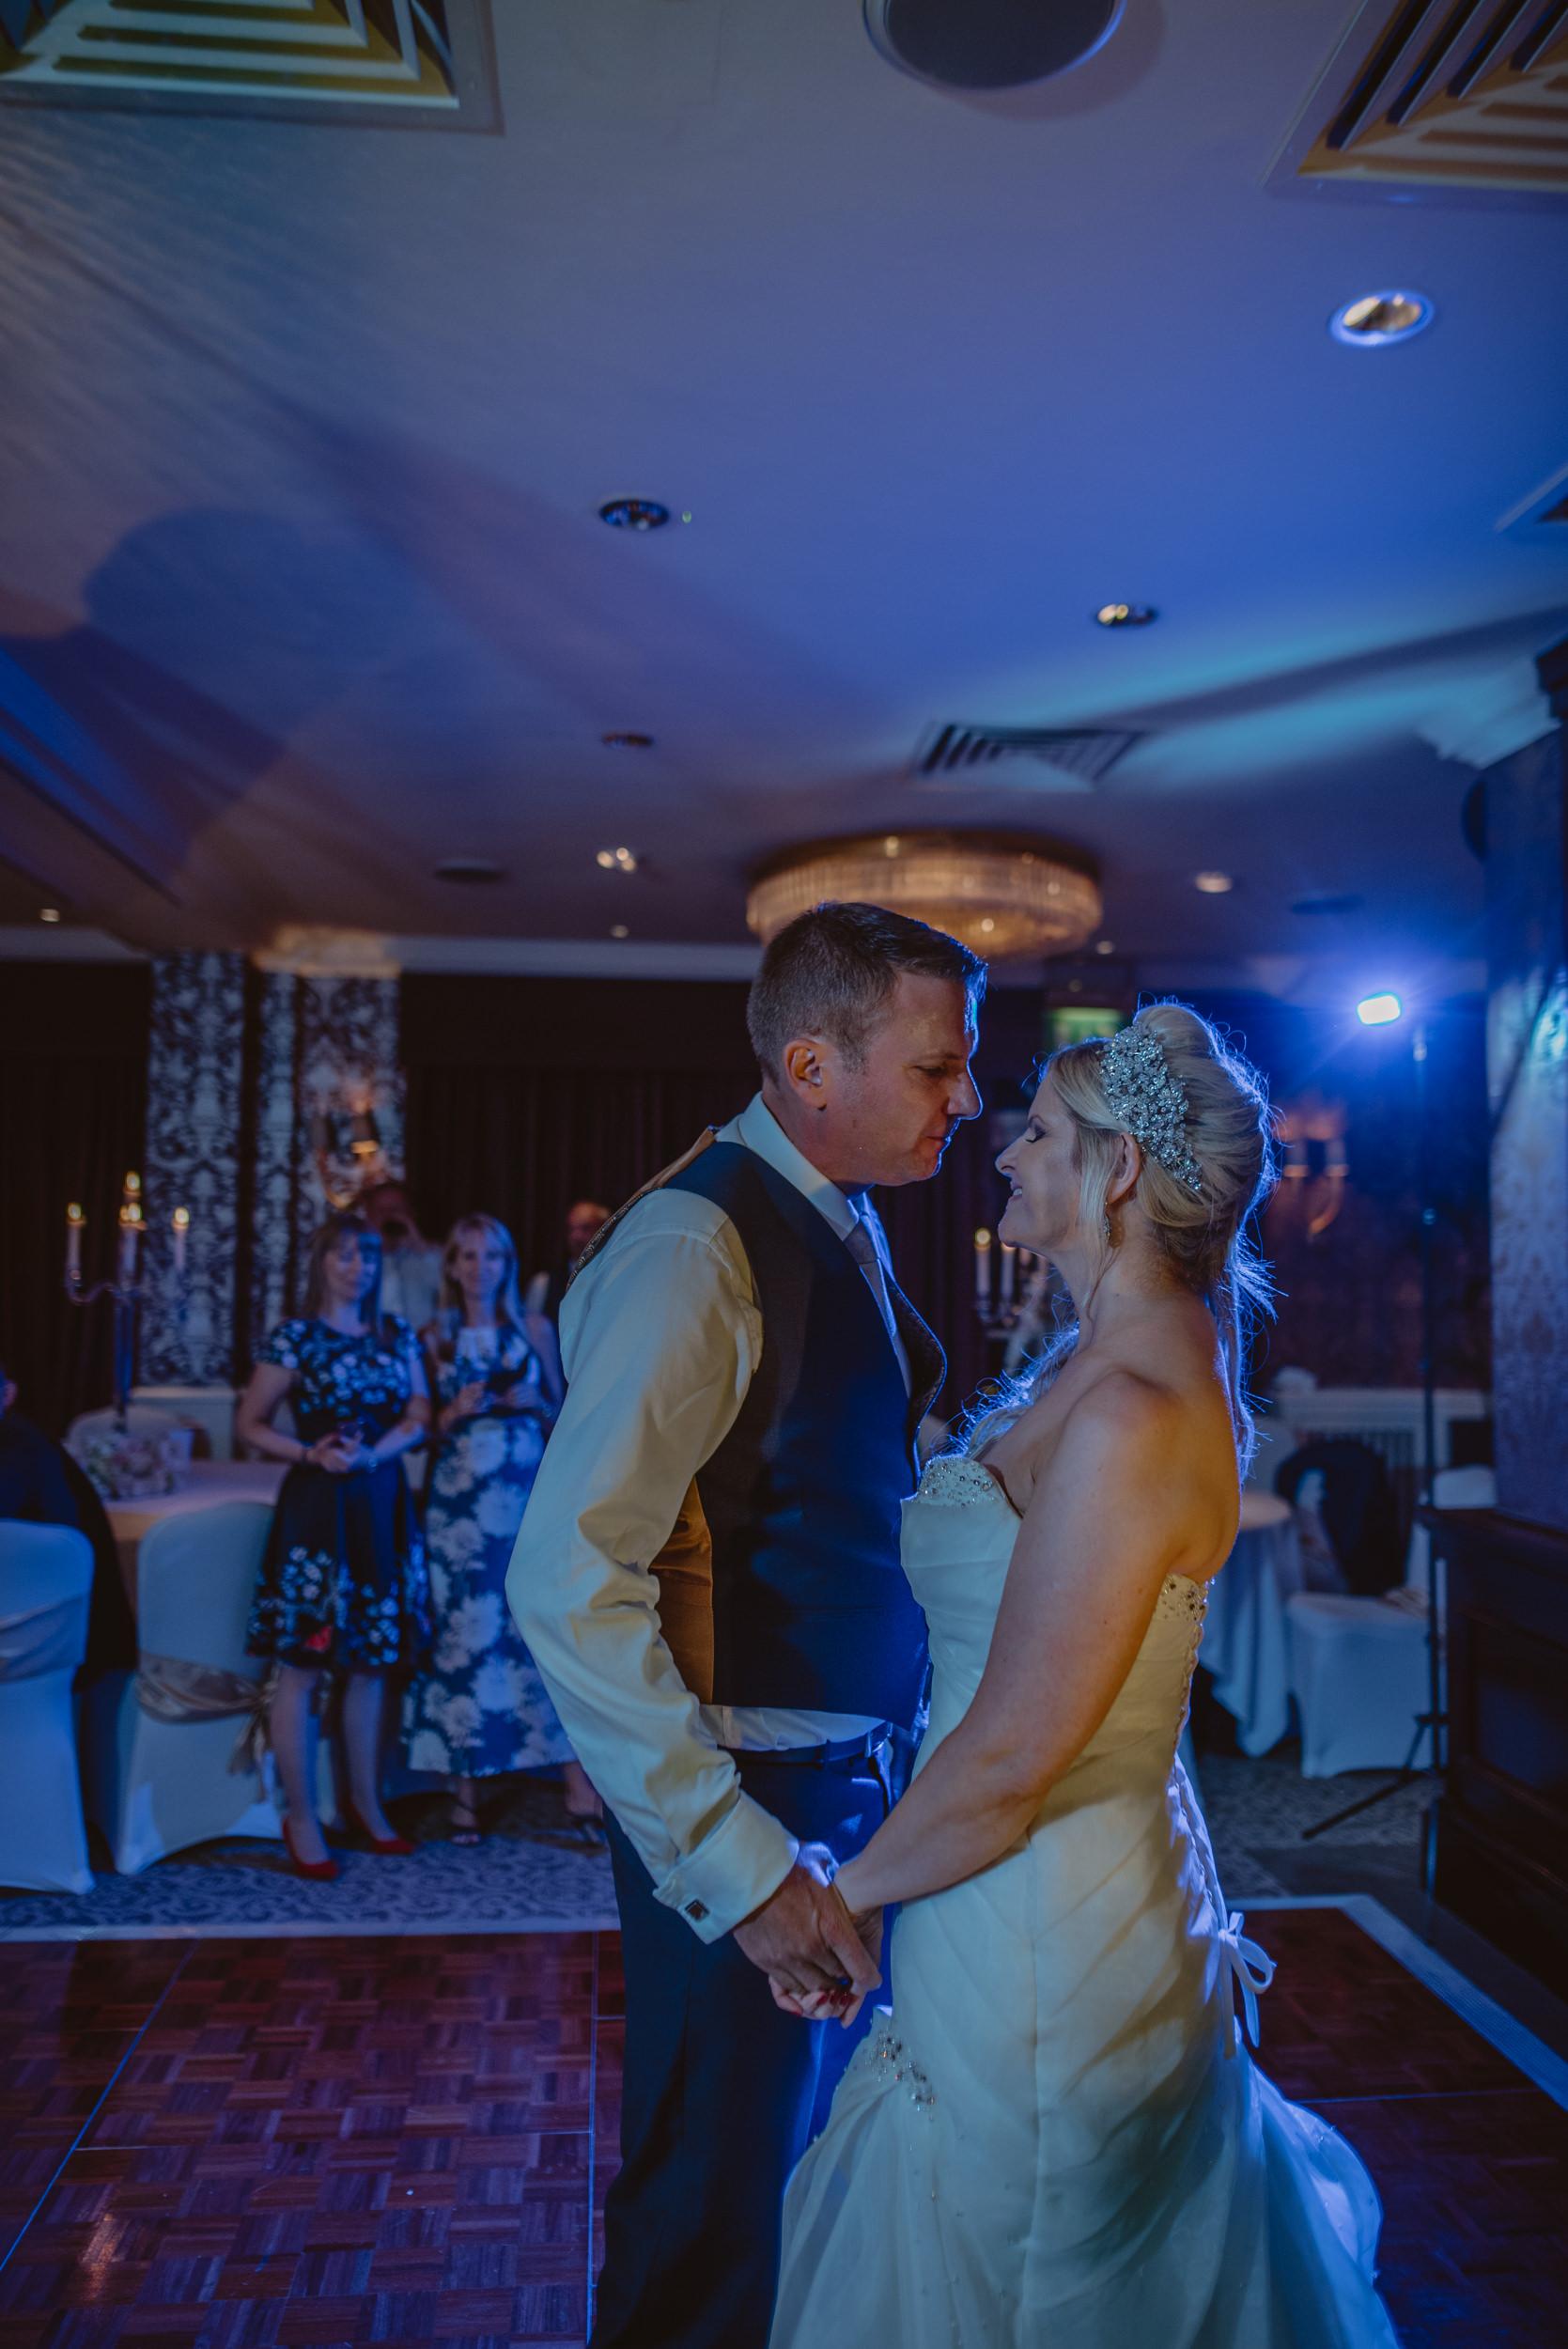 Trisha-and-Roger-wedding-The-Priory-Church-and-Chewton-Glen-Hotel-Christchurch-Manu-Mendoza-Wedding-Photography-507.jpg